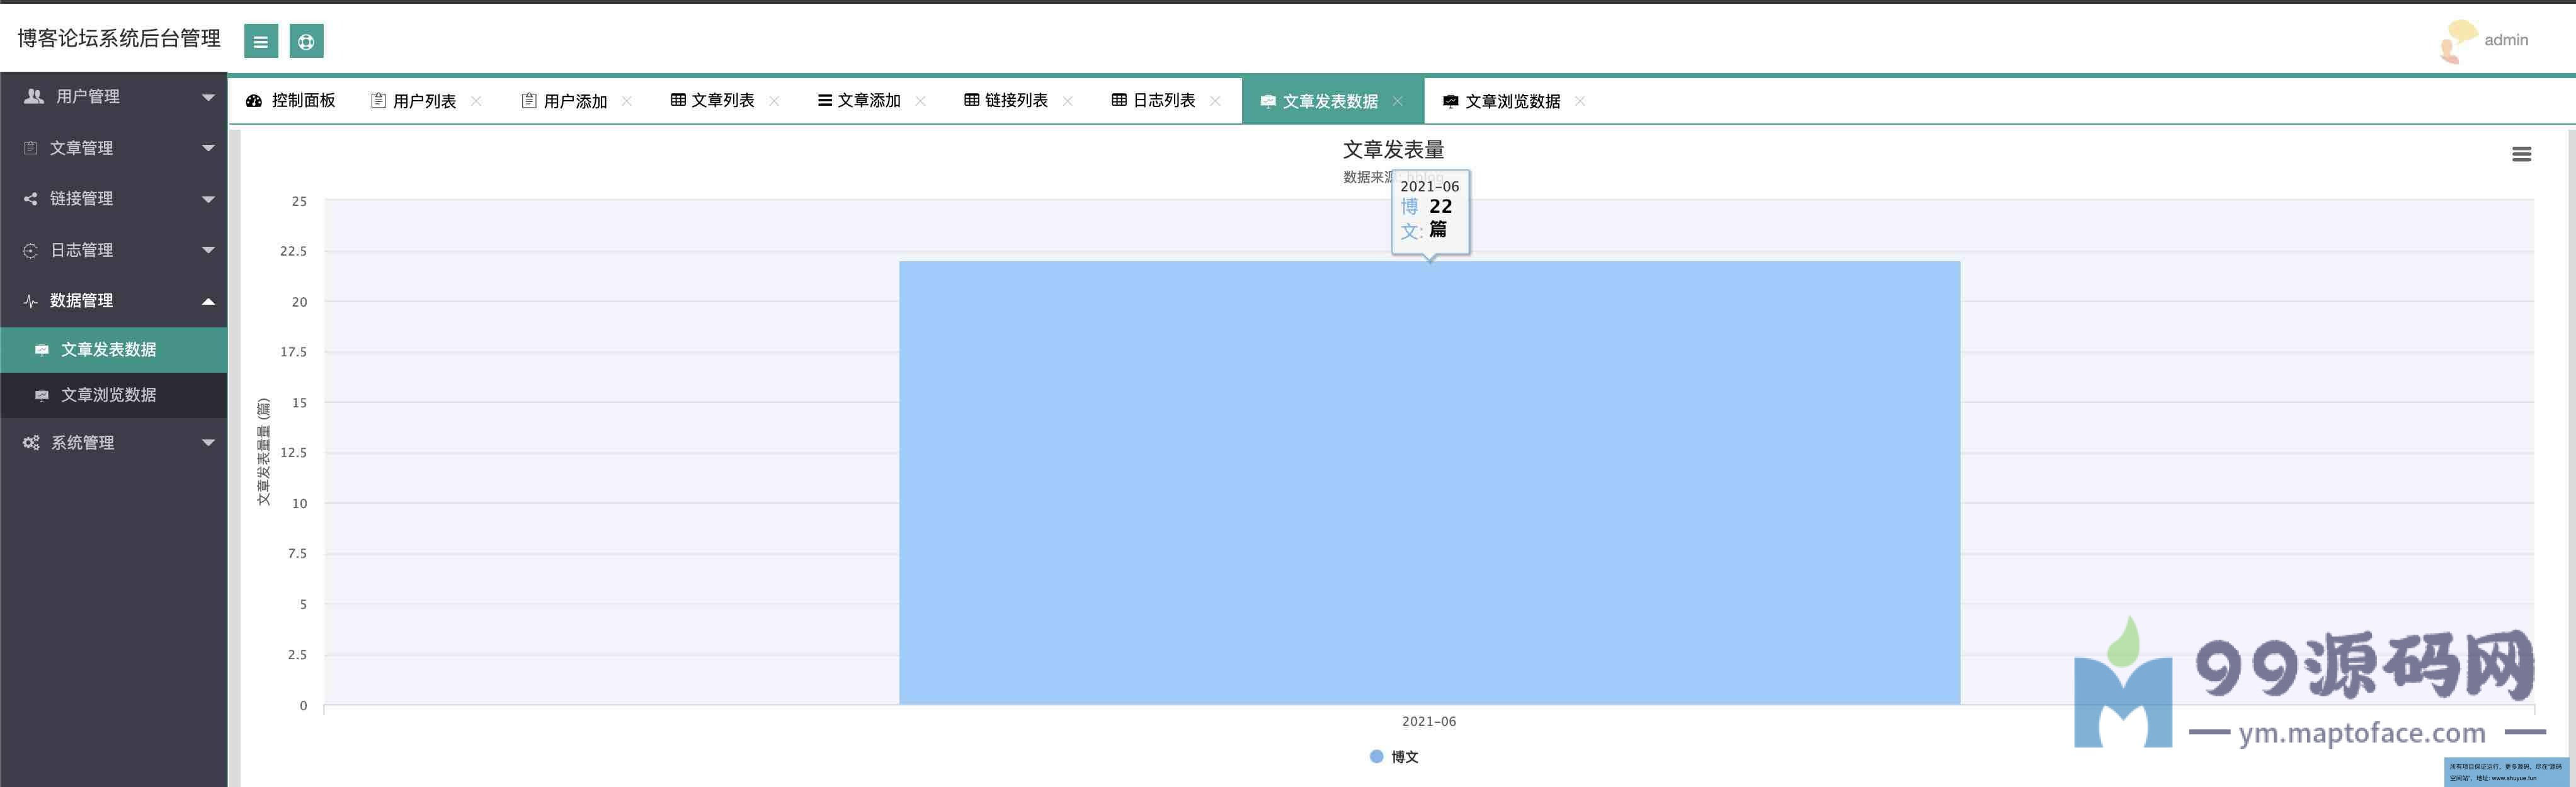 SpringBoot博客论坛管理系统(含设计报告)